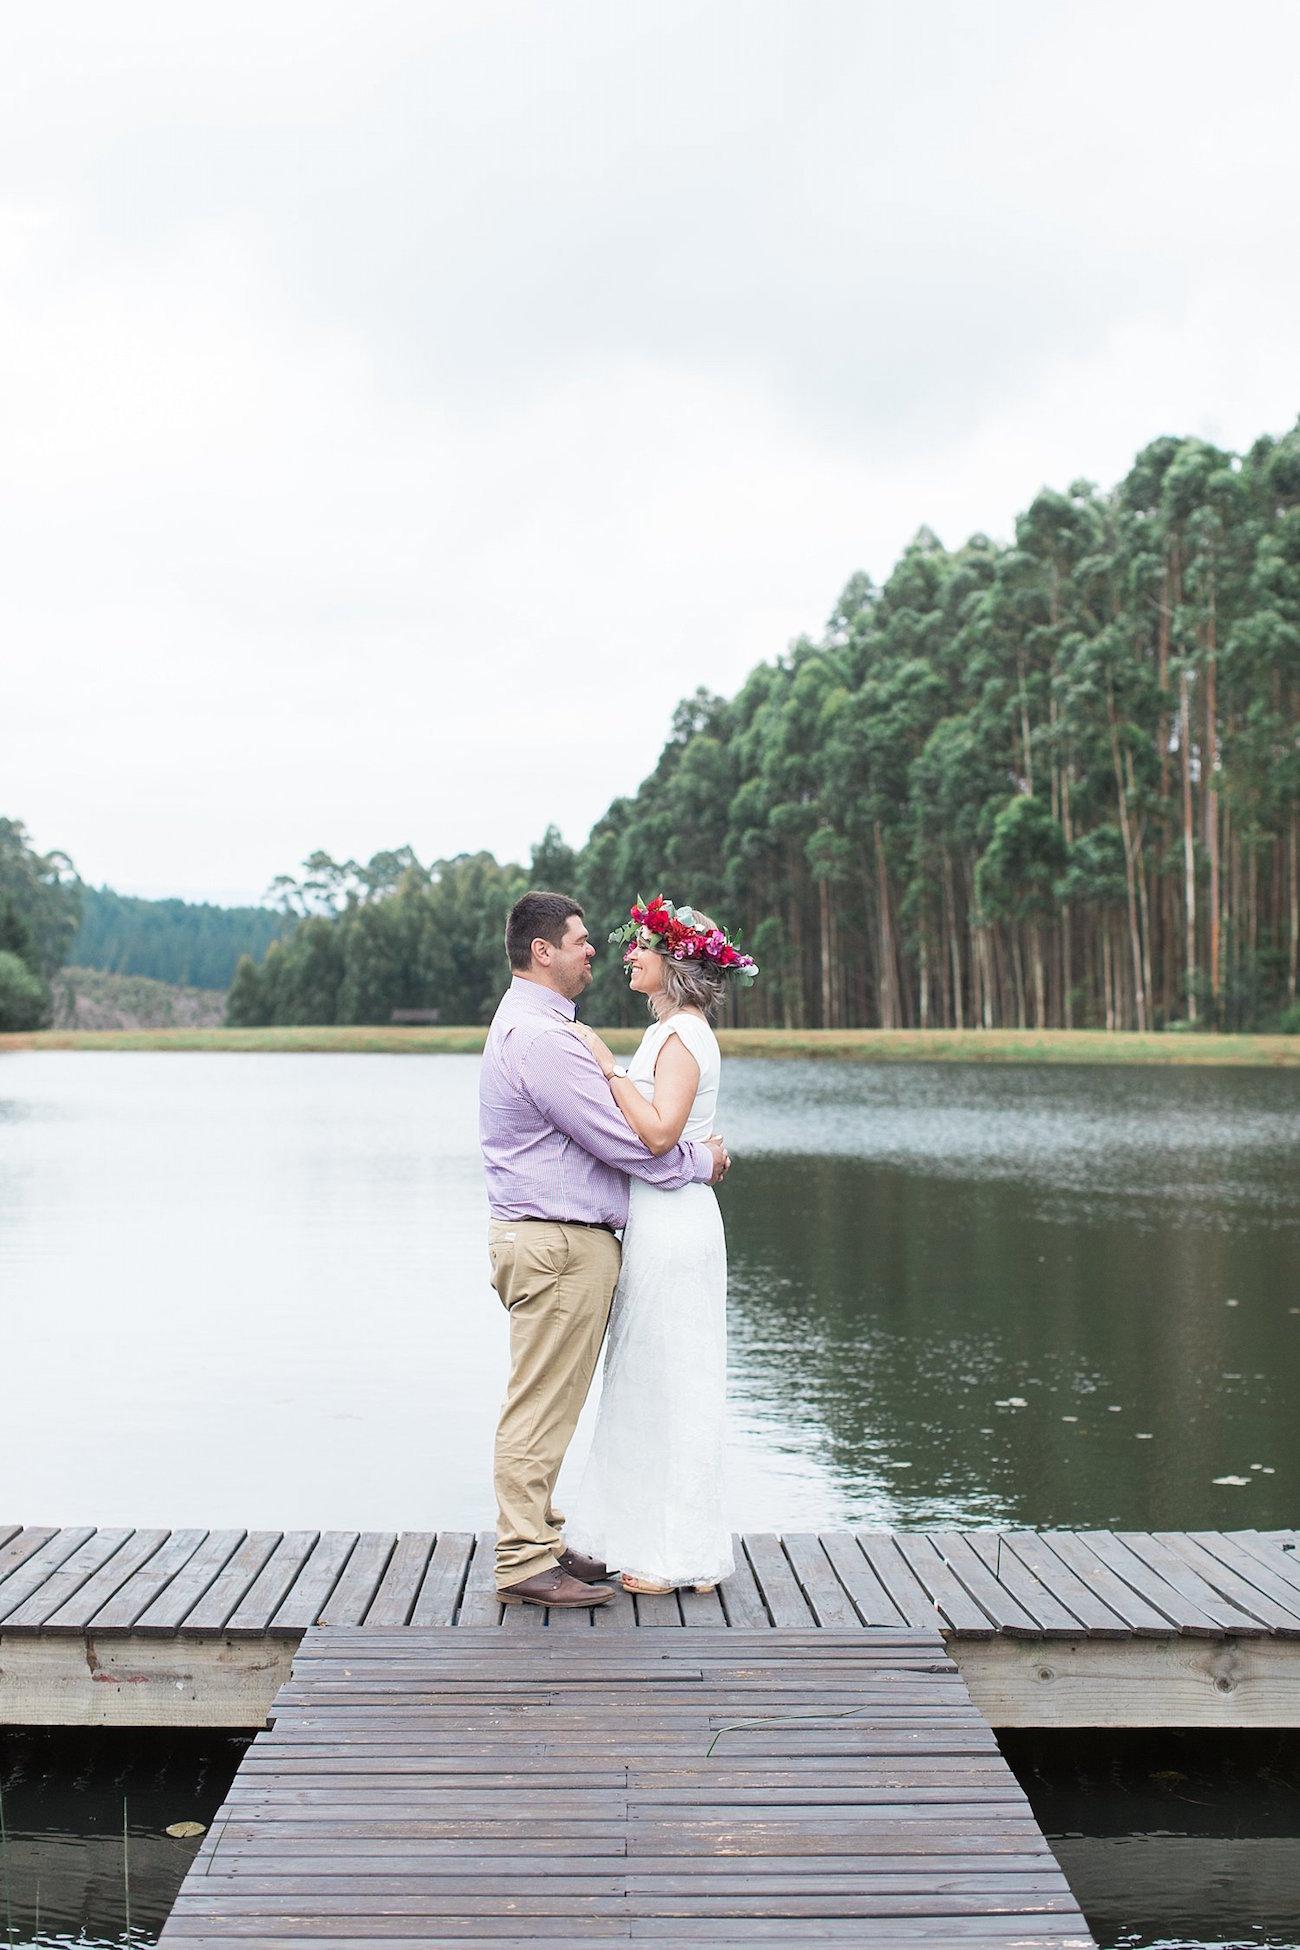 Wedding at Mina's Cafe Limpopo | Image: Alicia Landman